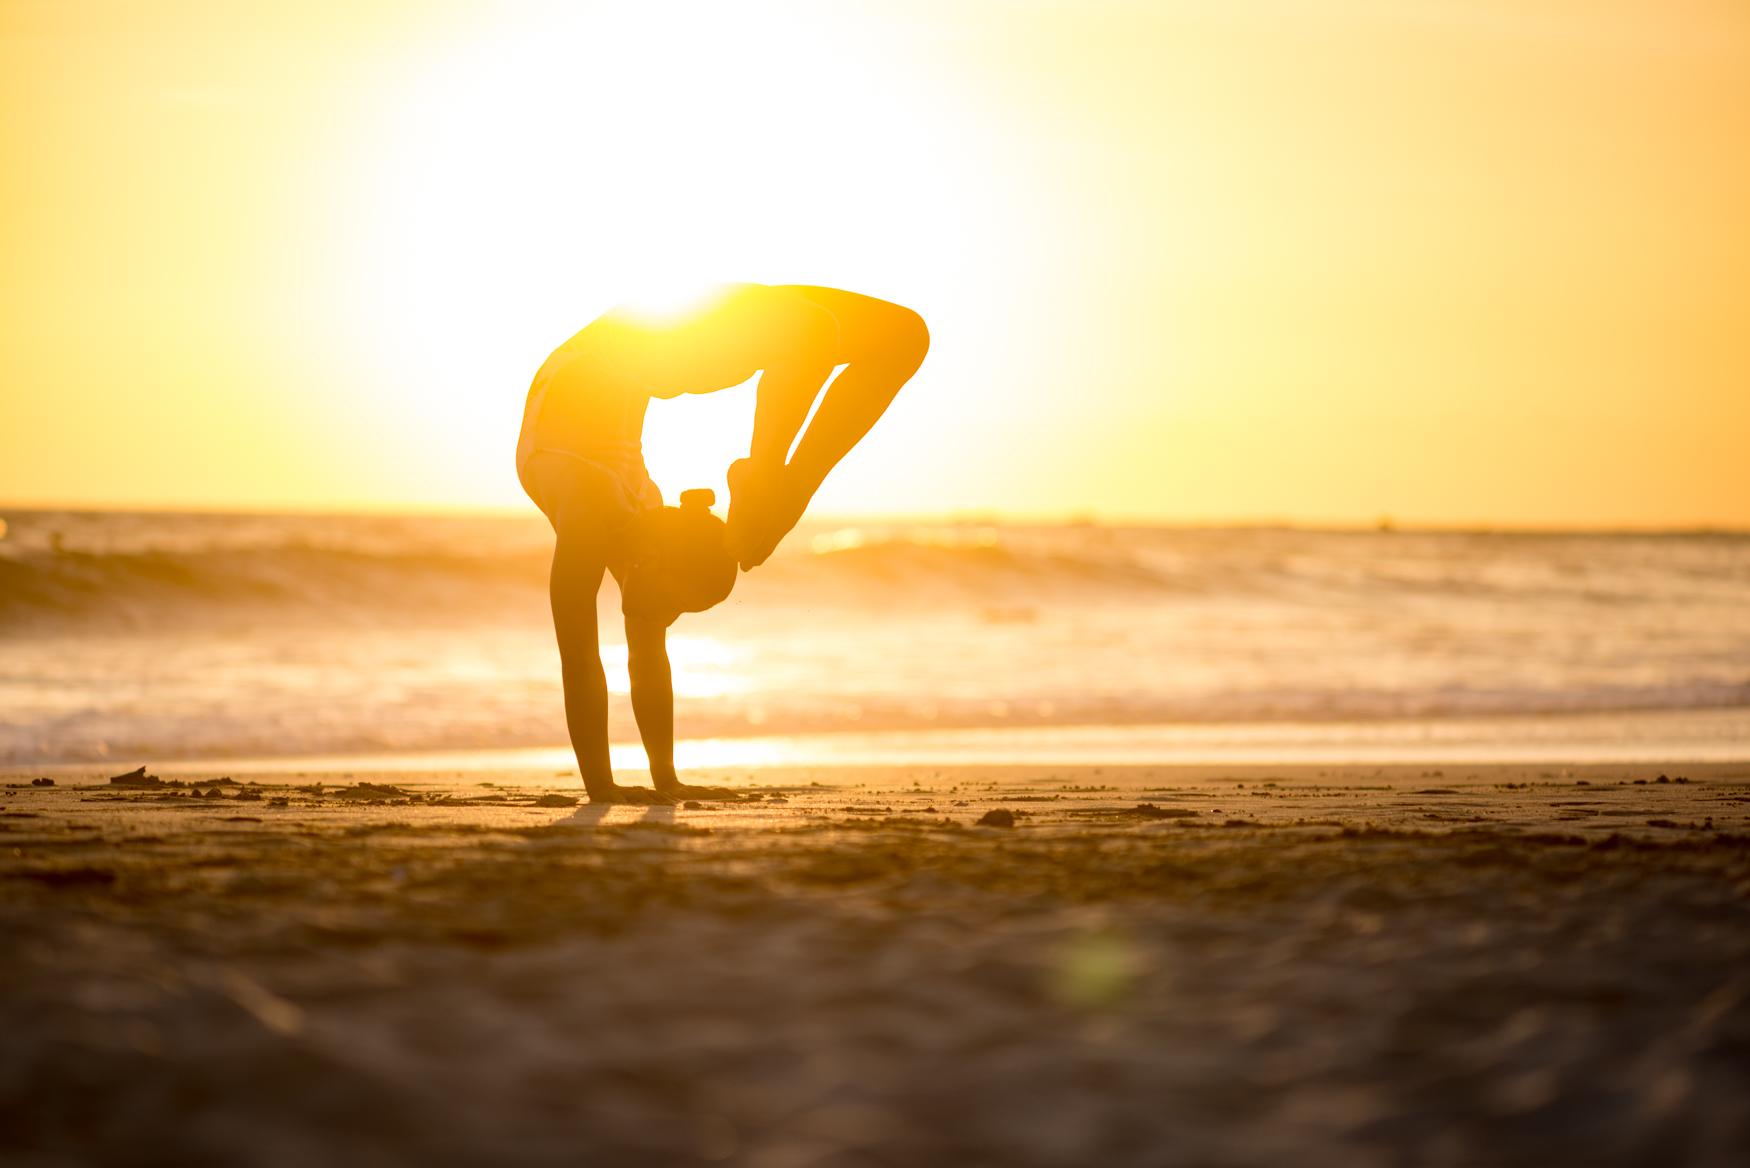 LuanaFara-Vrishchikasana-Yoga-Asana-Sunset-CostaRica